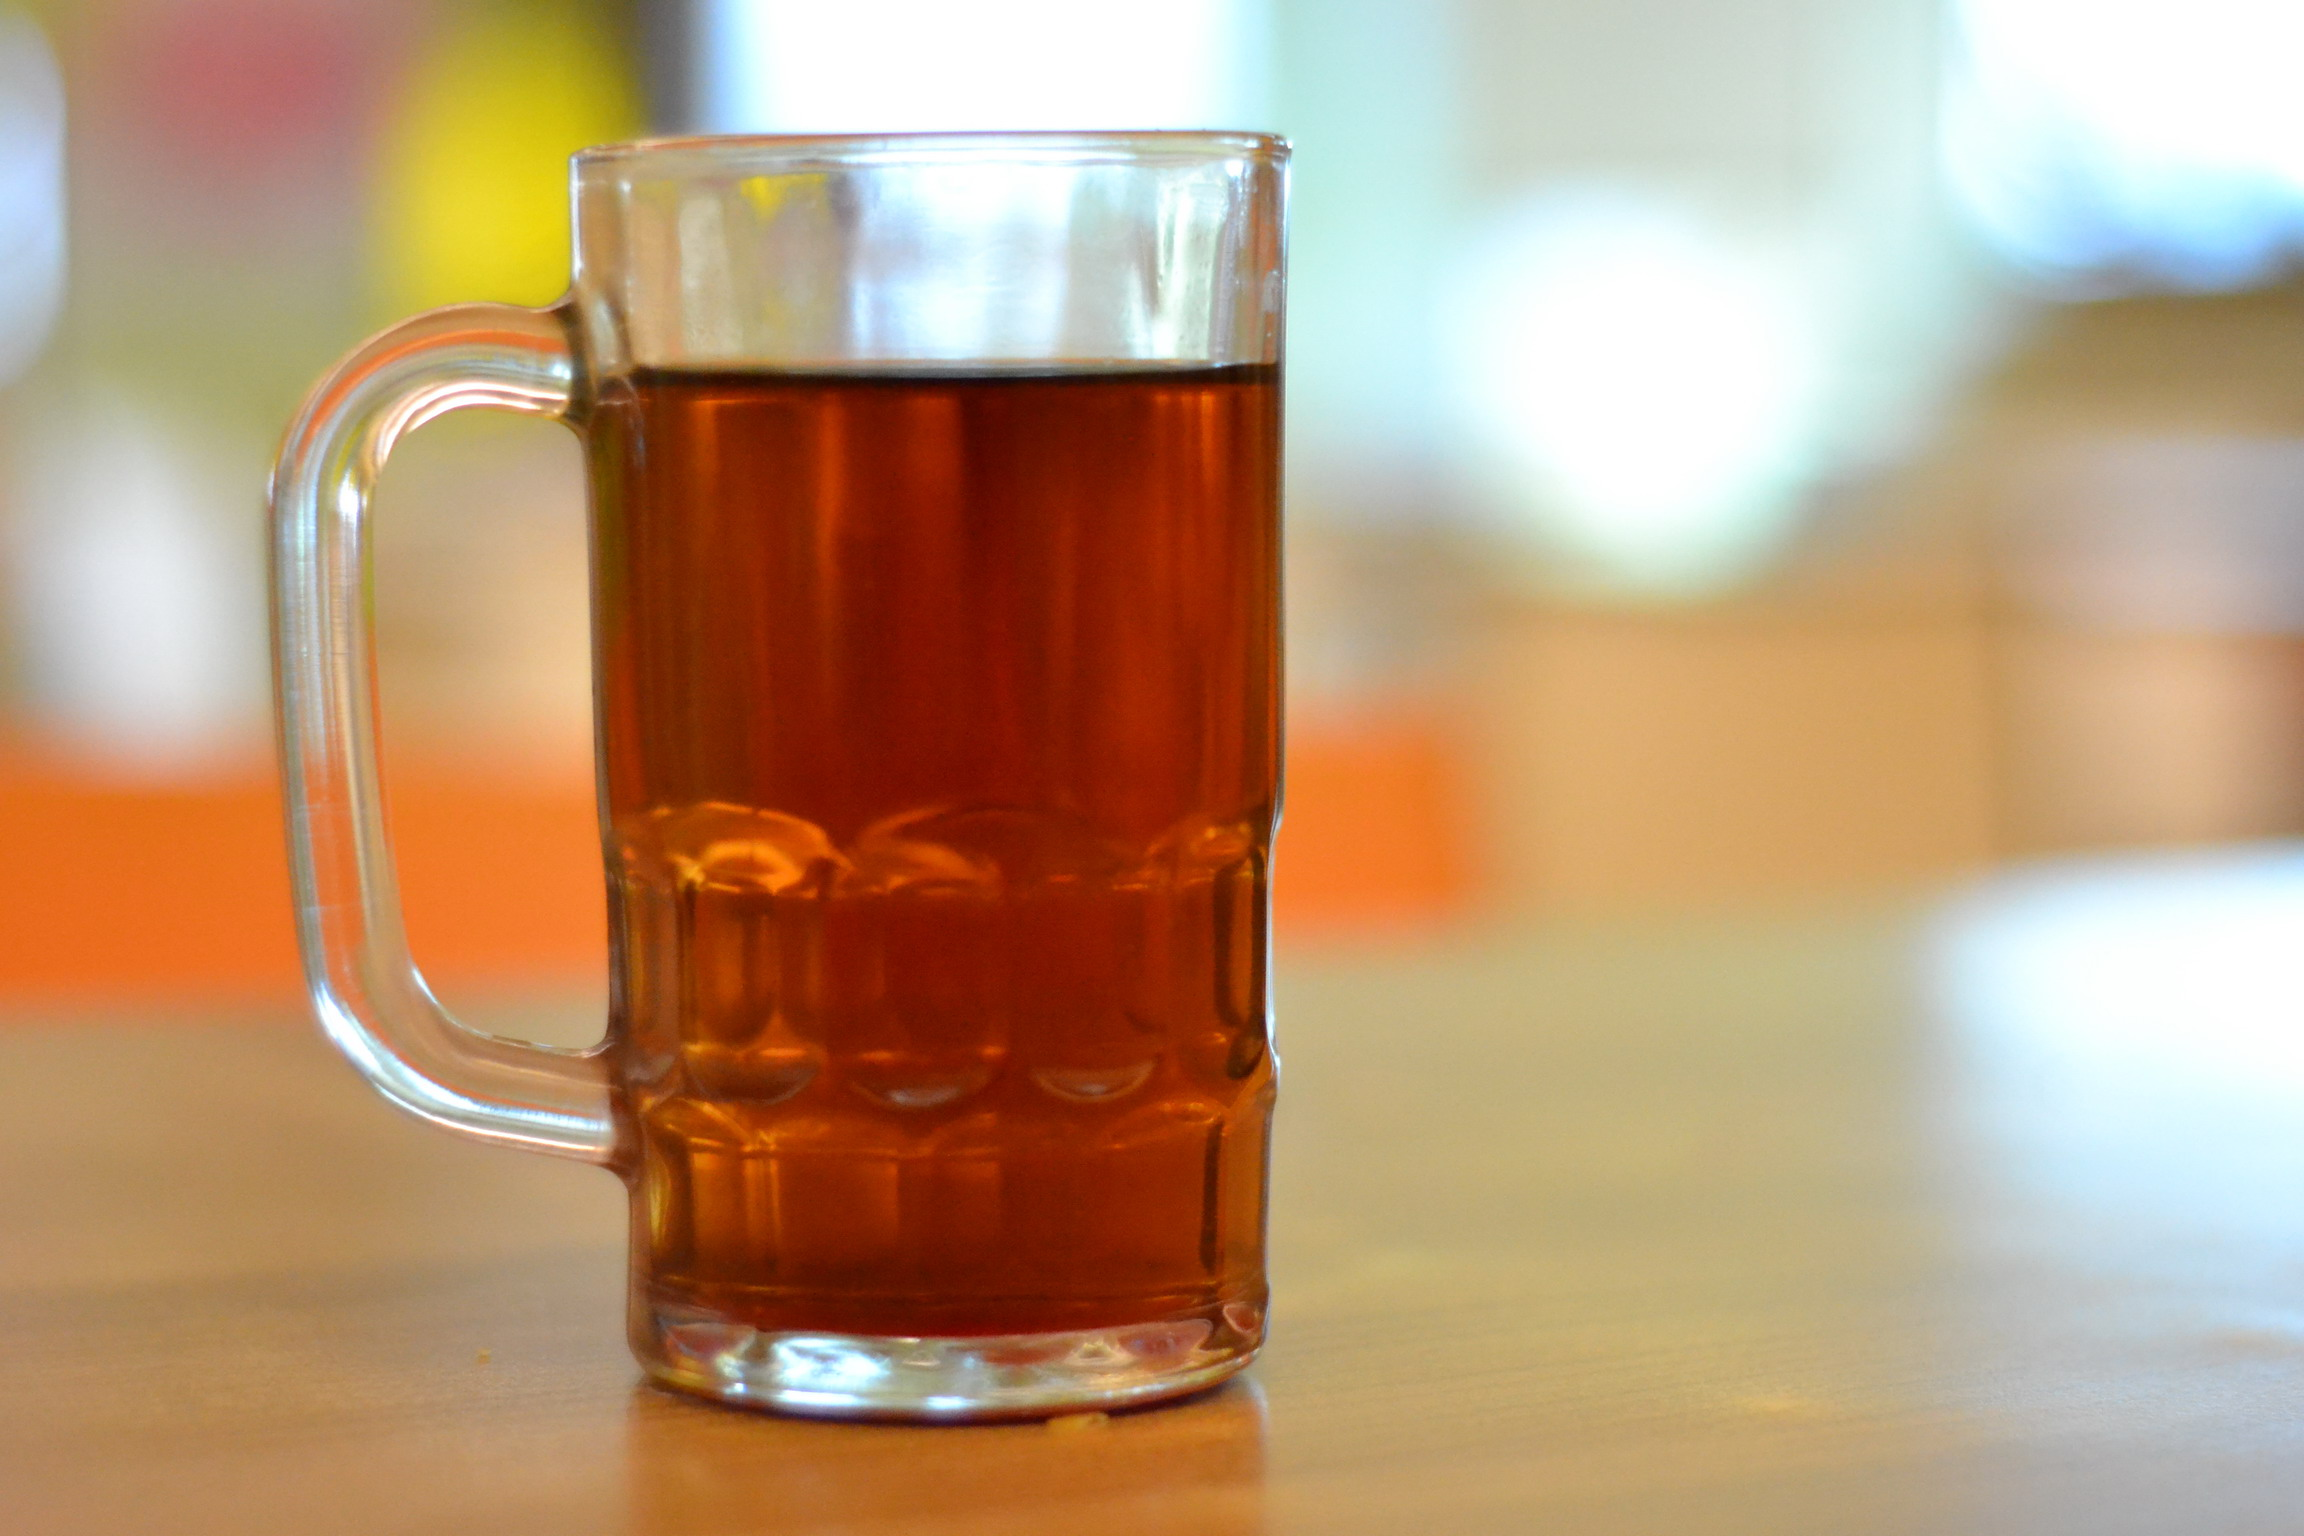 Tea in a bear glass photo